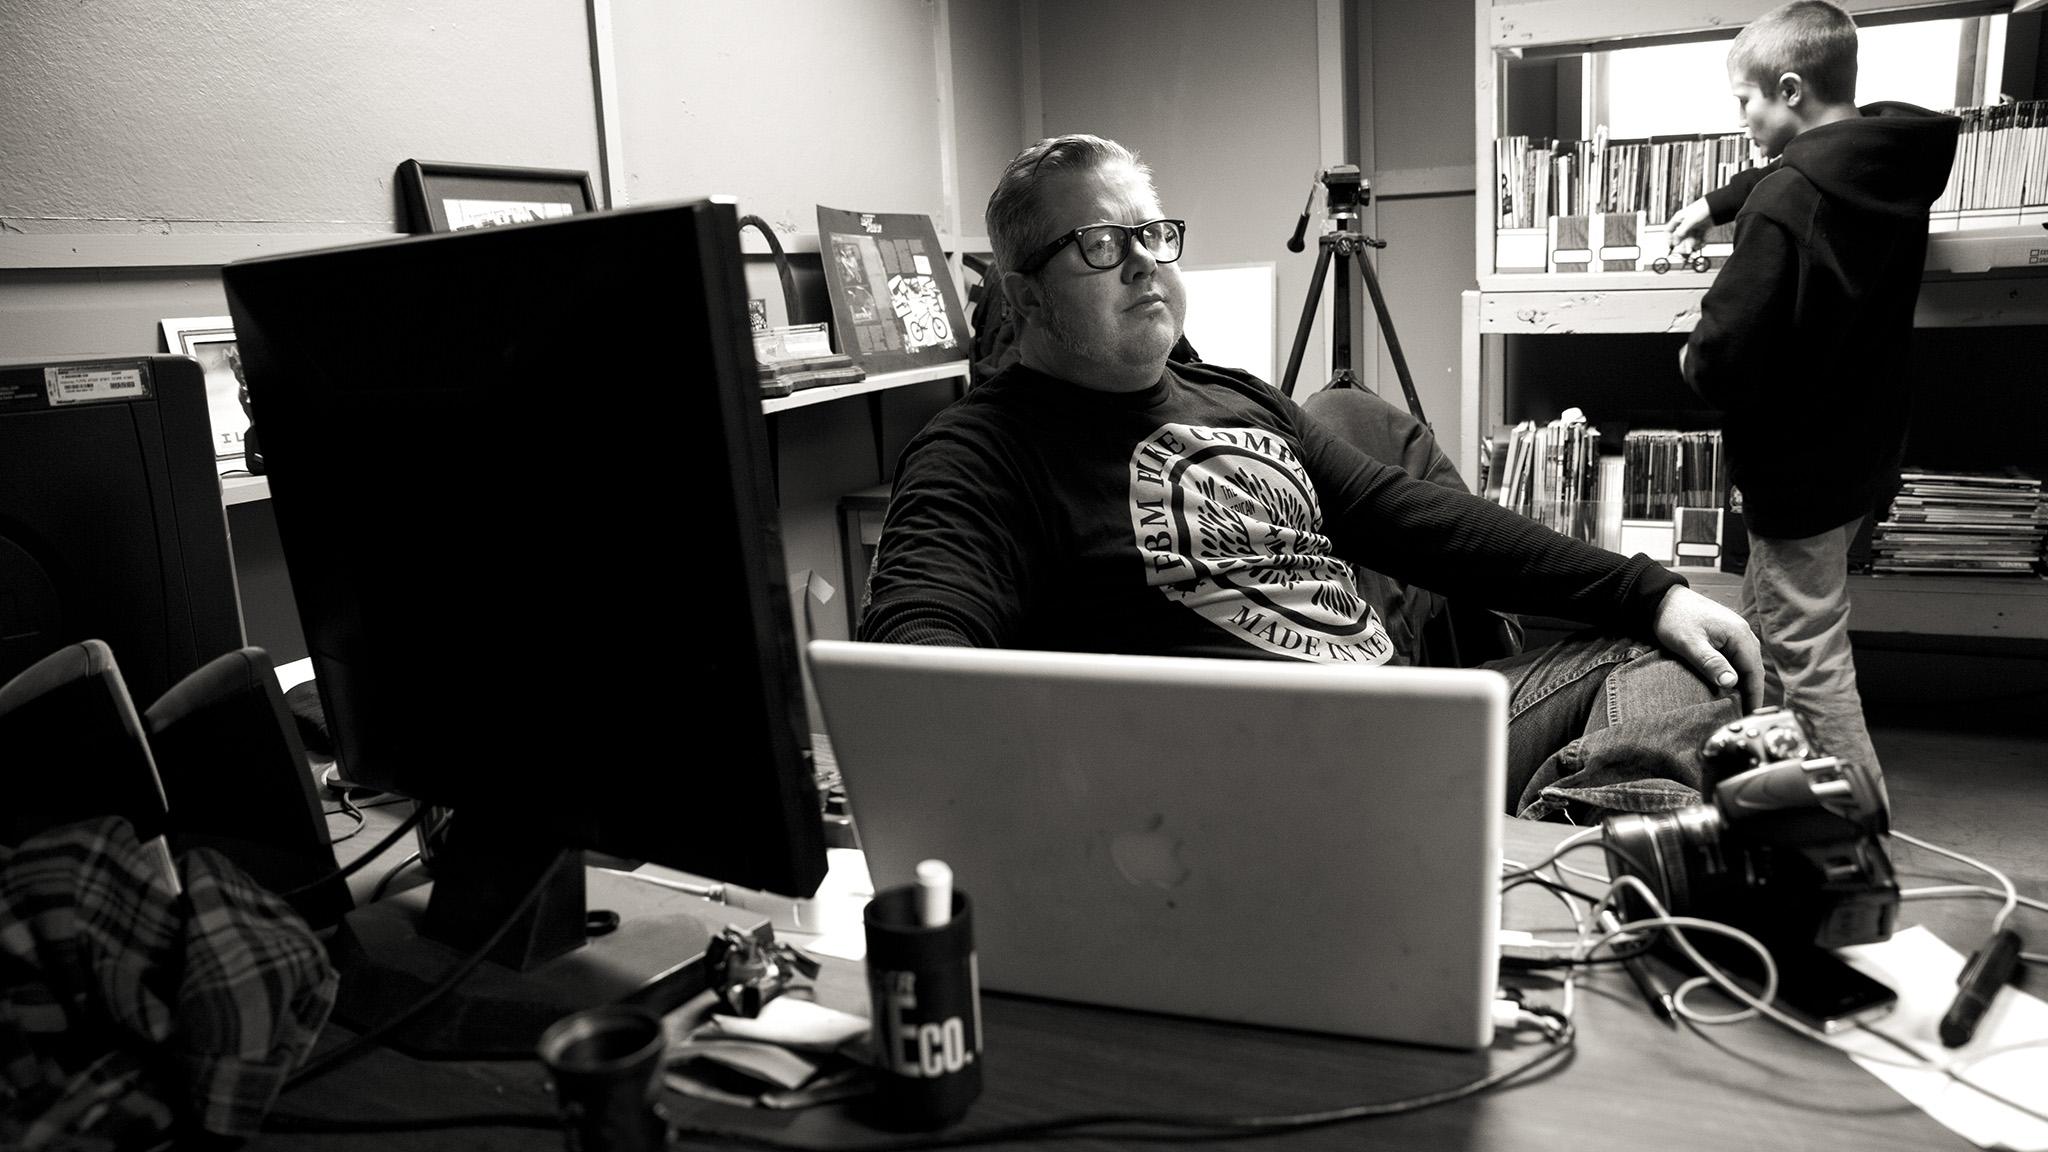 Steve Crandall at FBM headquarters